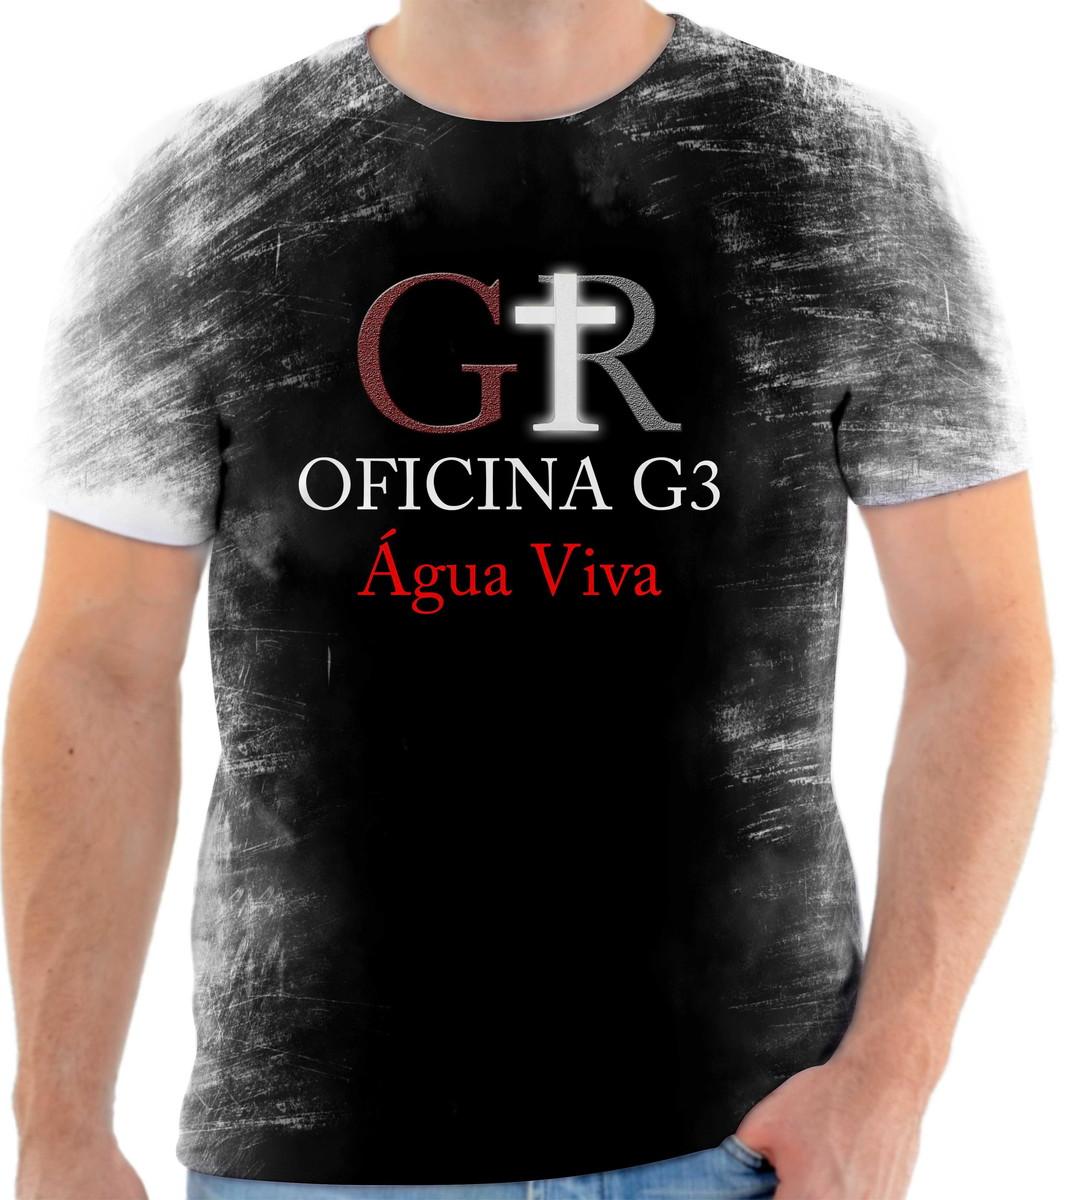 Camisa Camiseta Personalizada Banda De Rock Oficina G3 4 no Elo7 ... ca34f4c105628